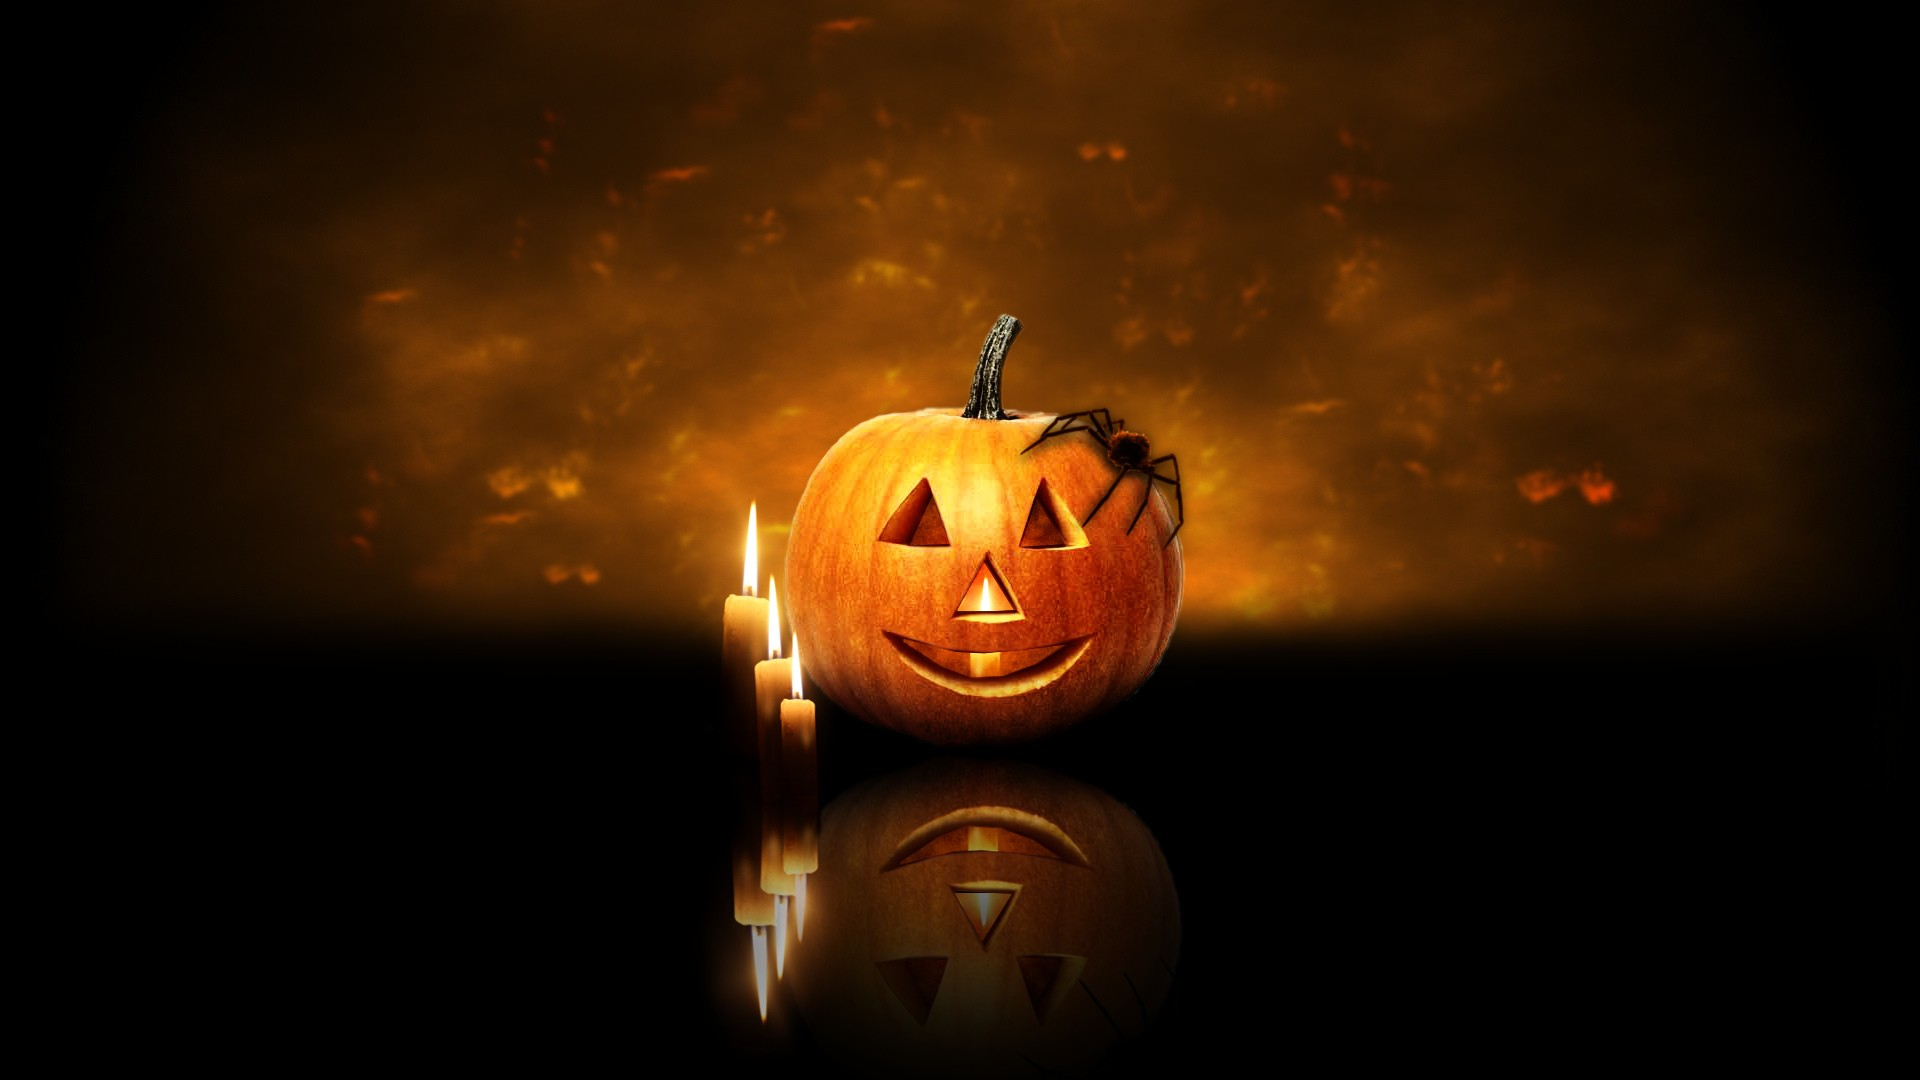 Happy Halloween 2012 New Pumpkin HD Wallpaper HD Wallpapers Cool 1920x1080